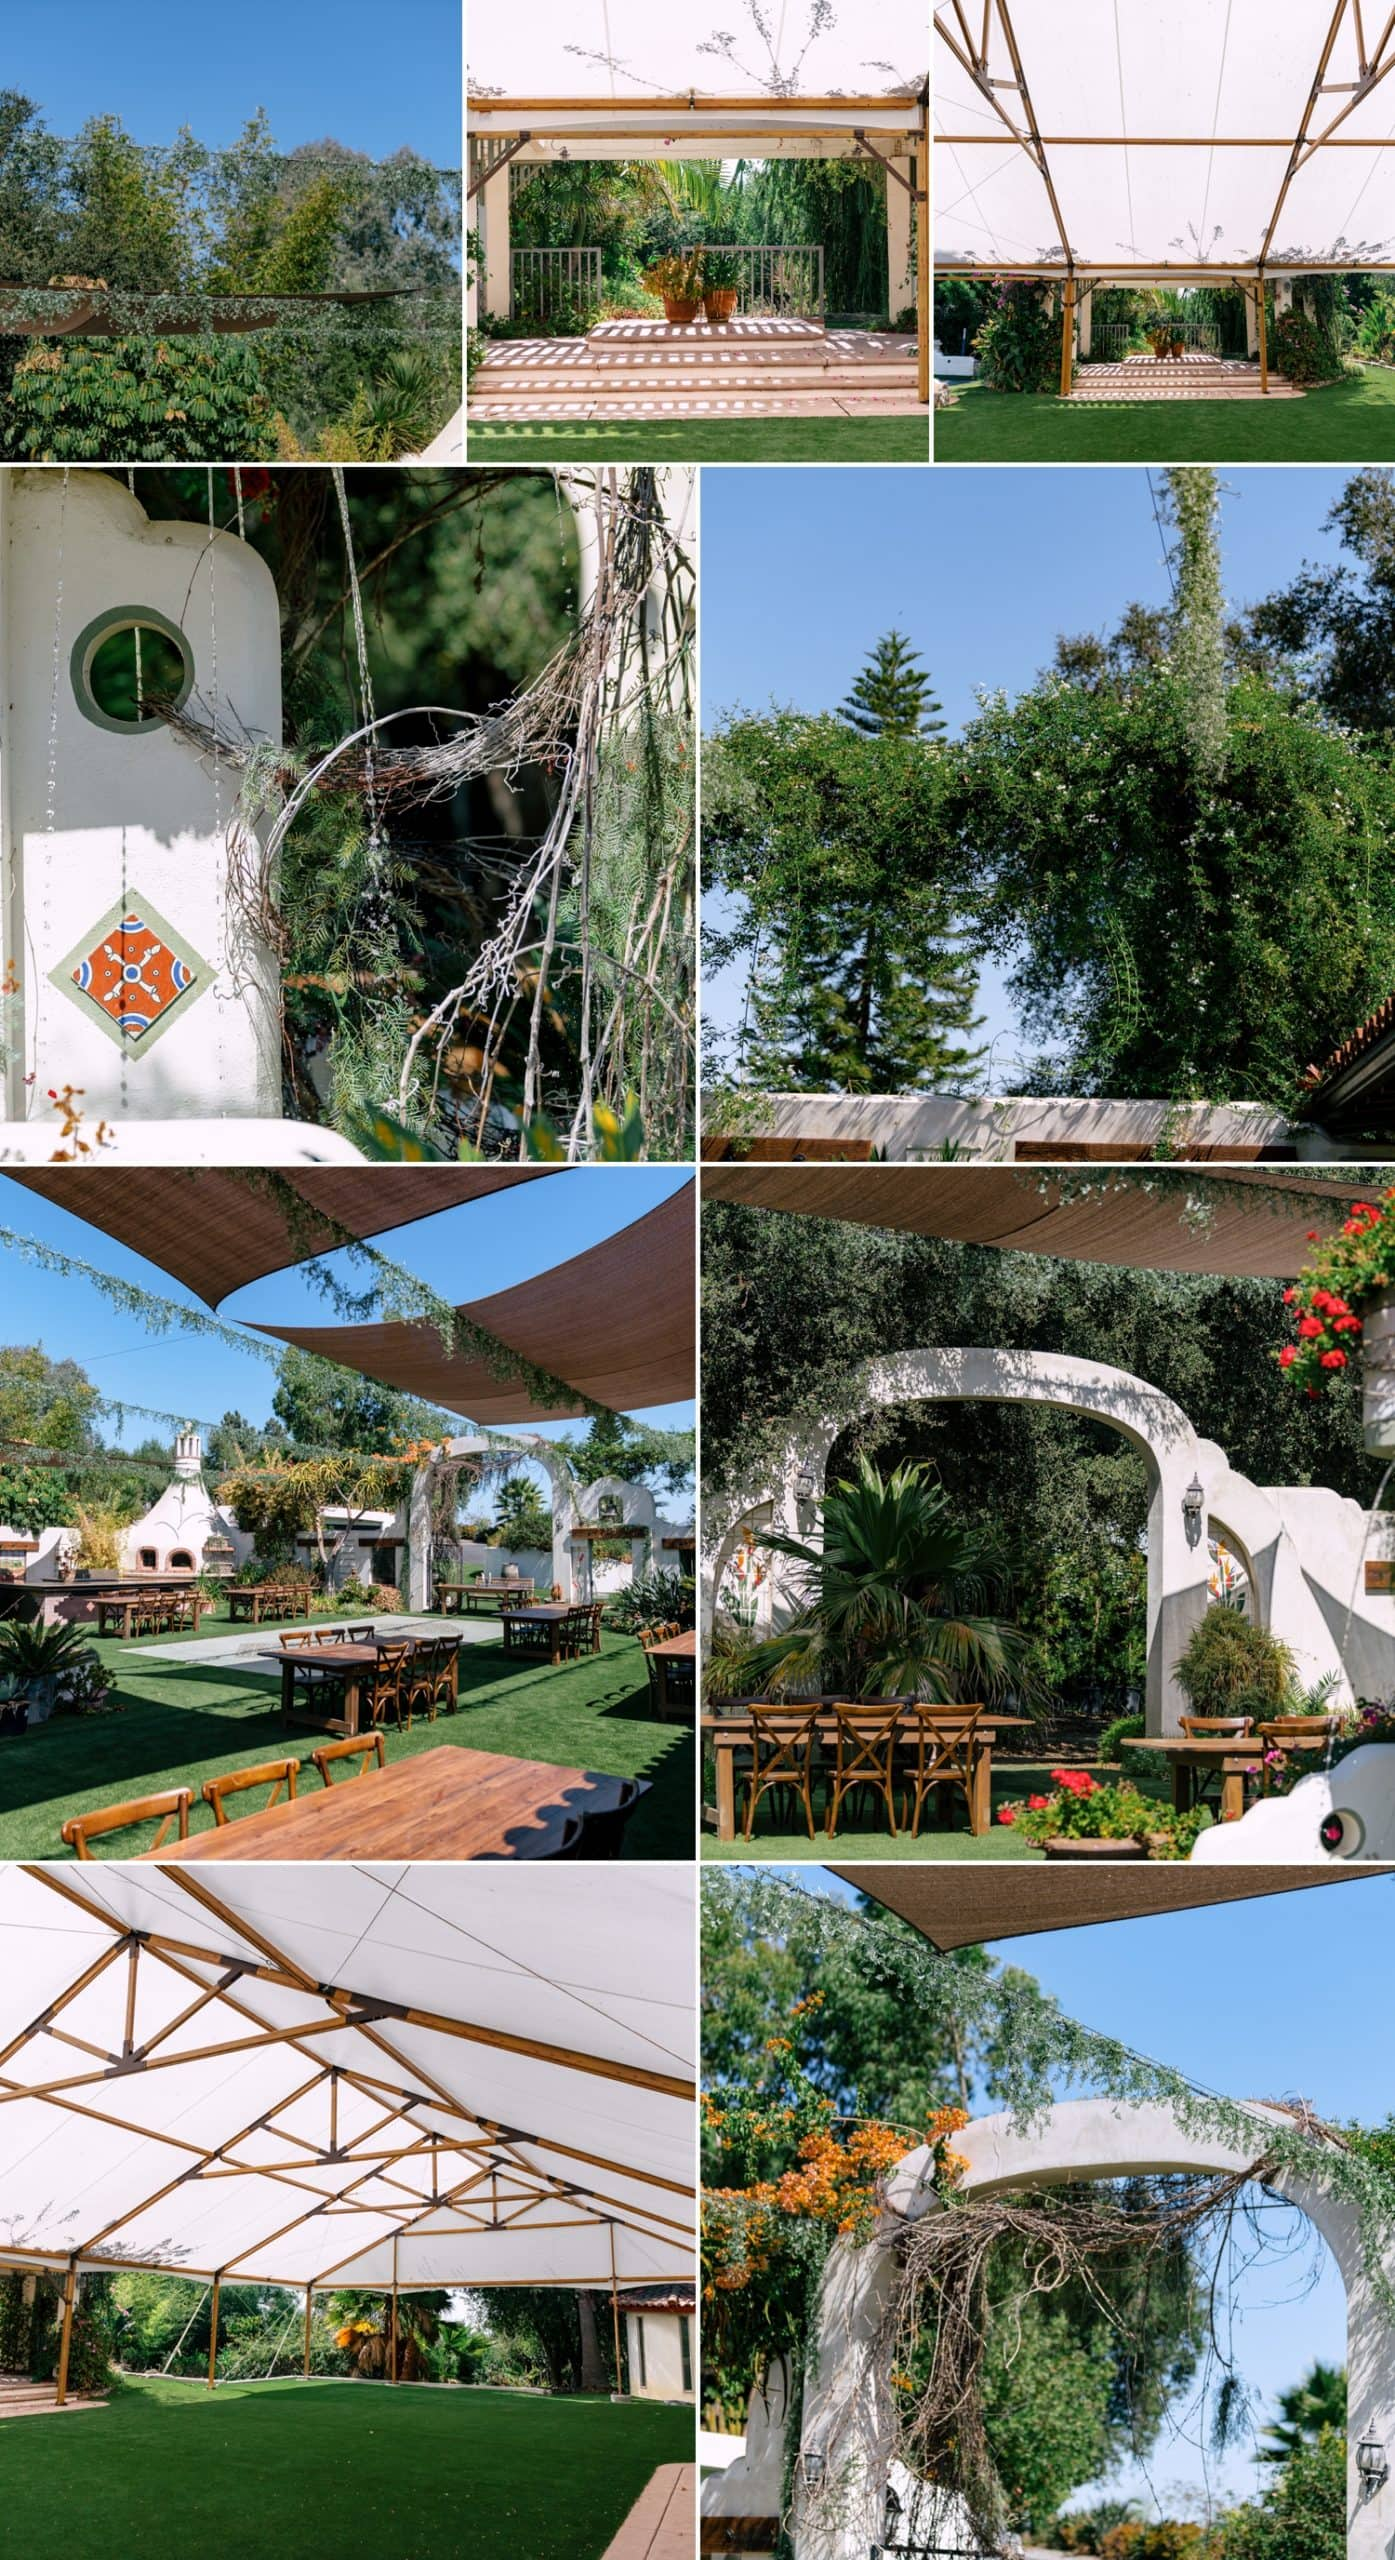 Spanish architecture at Tivoli wedding venue.